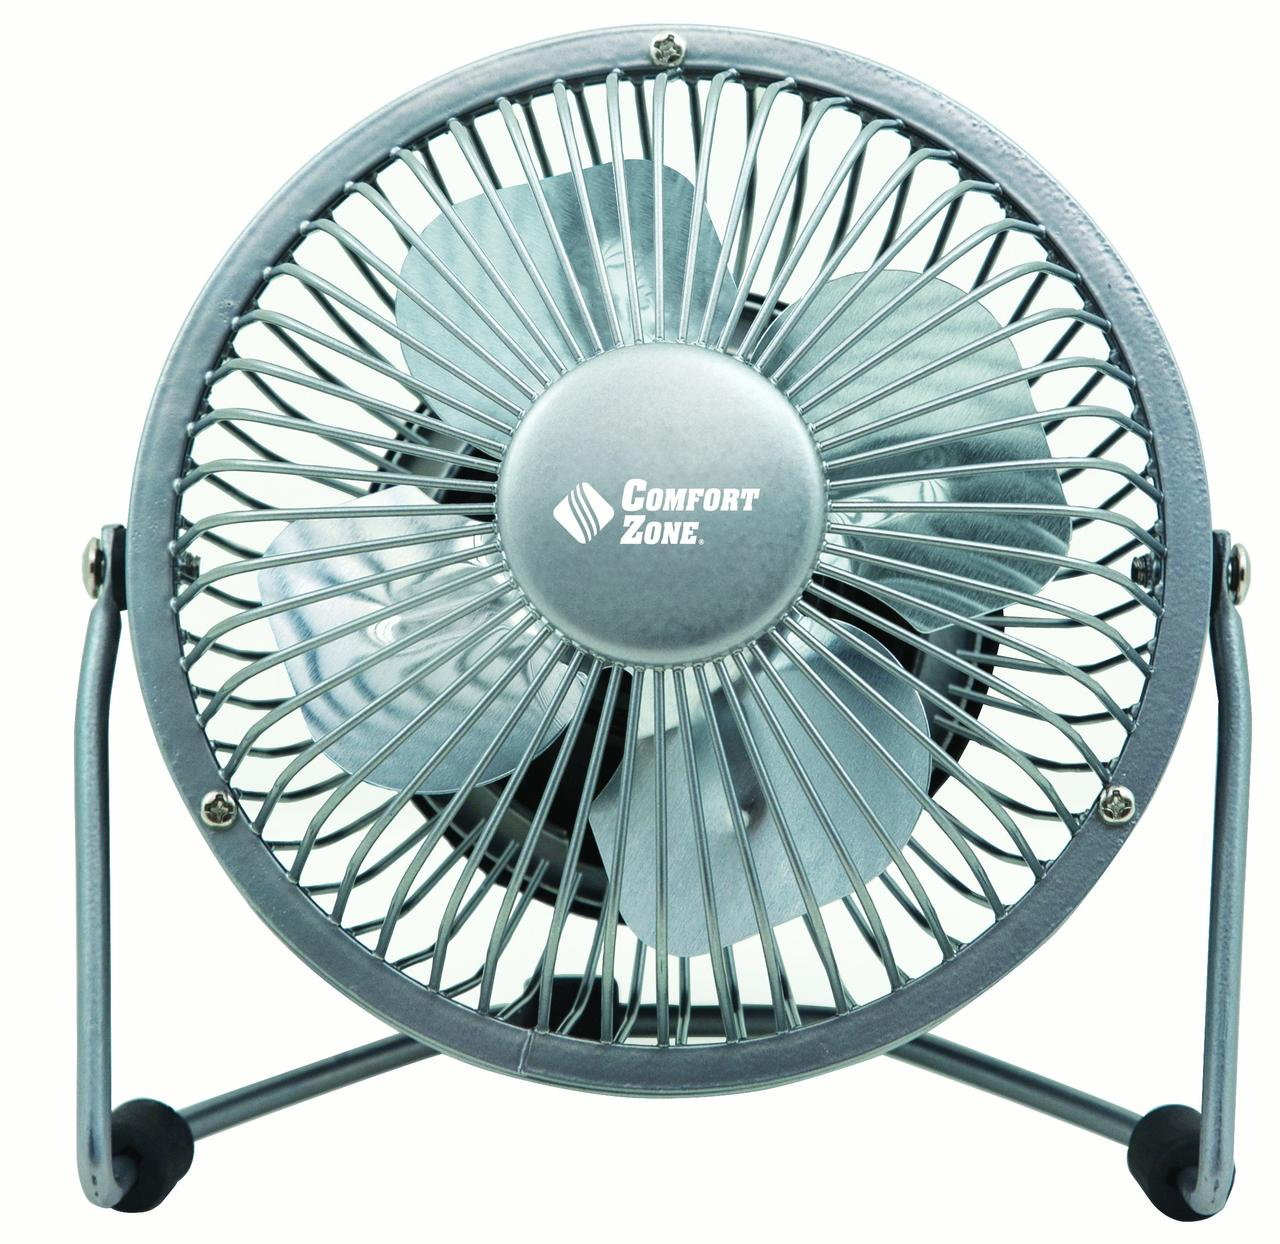 "Comfort Zone 4"" High Velocity USB Fan"